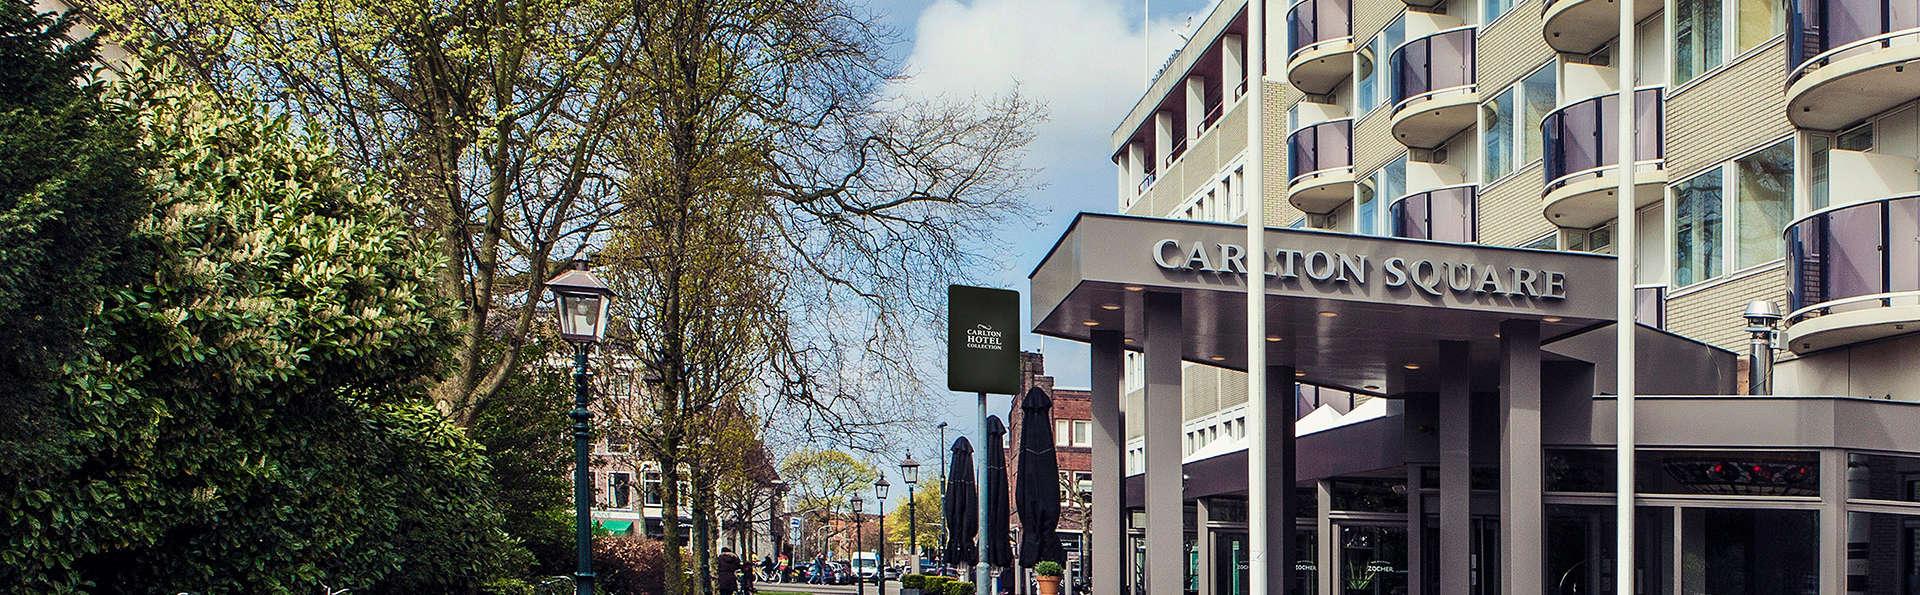 Carlton Square Hotel Haarlem - Edit_Front.jpg